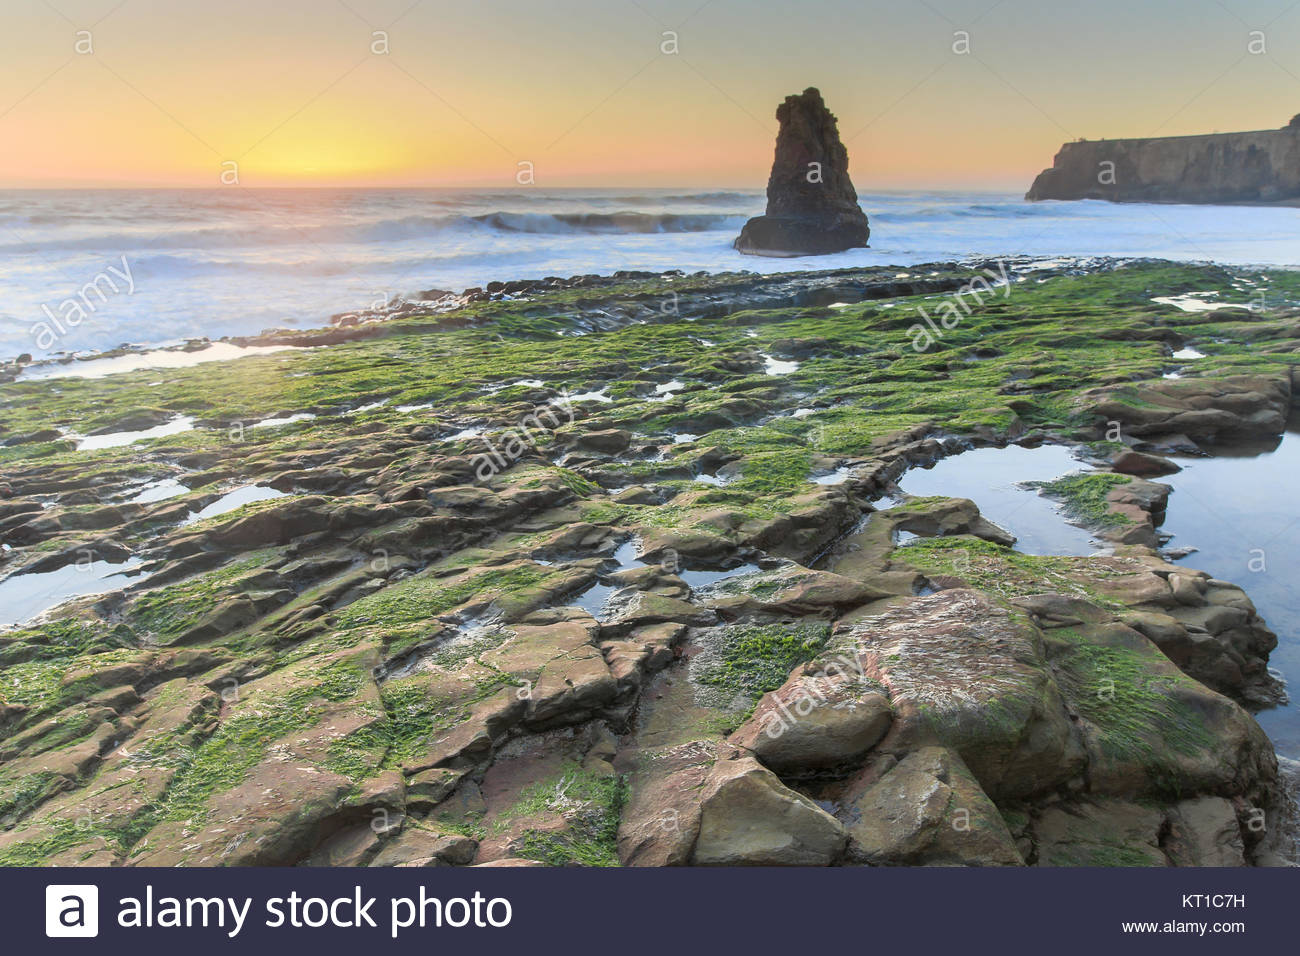 Davenport Rugged Coastline Sunset - Stock Image